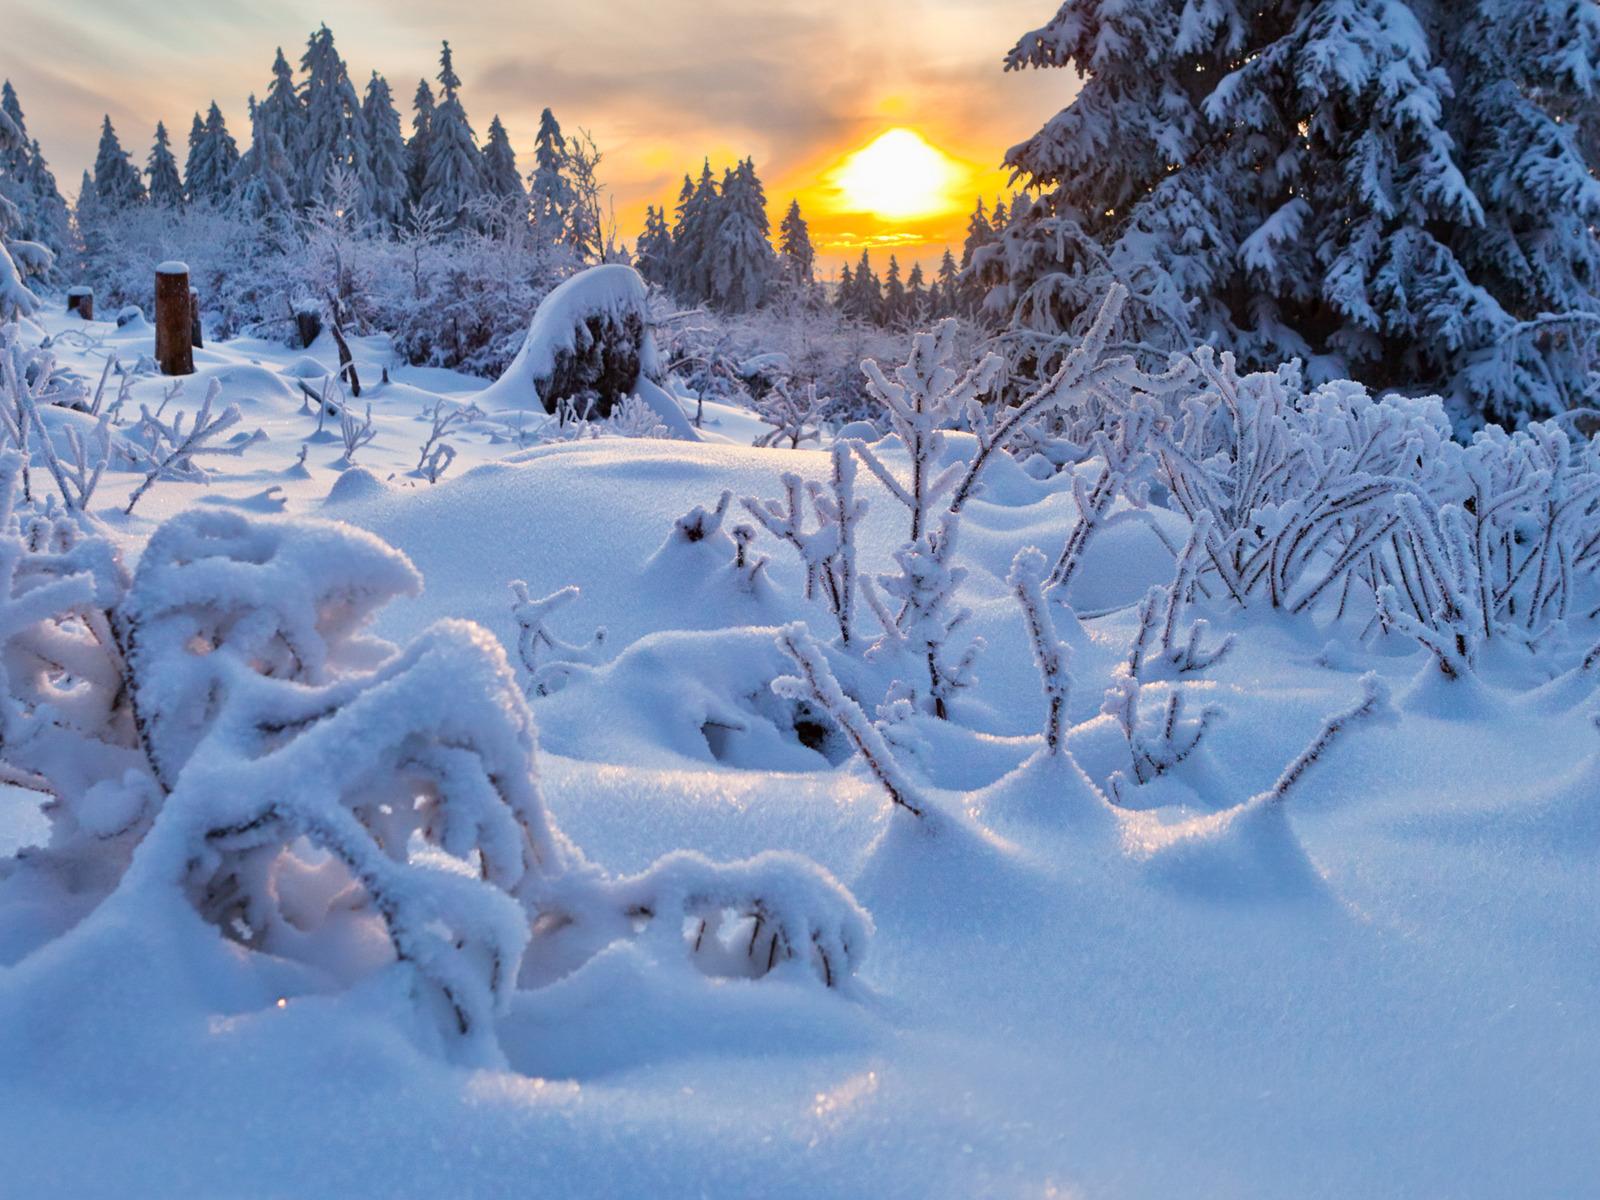 Wallpaper ไหนว่าปีนี้จะหนาวสุดในรอบ 30 ปี 50 Pic 228527-svetik